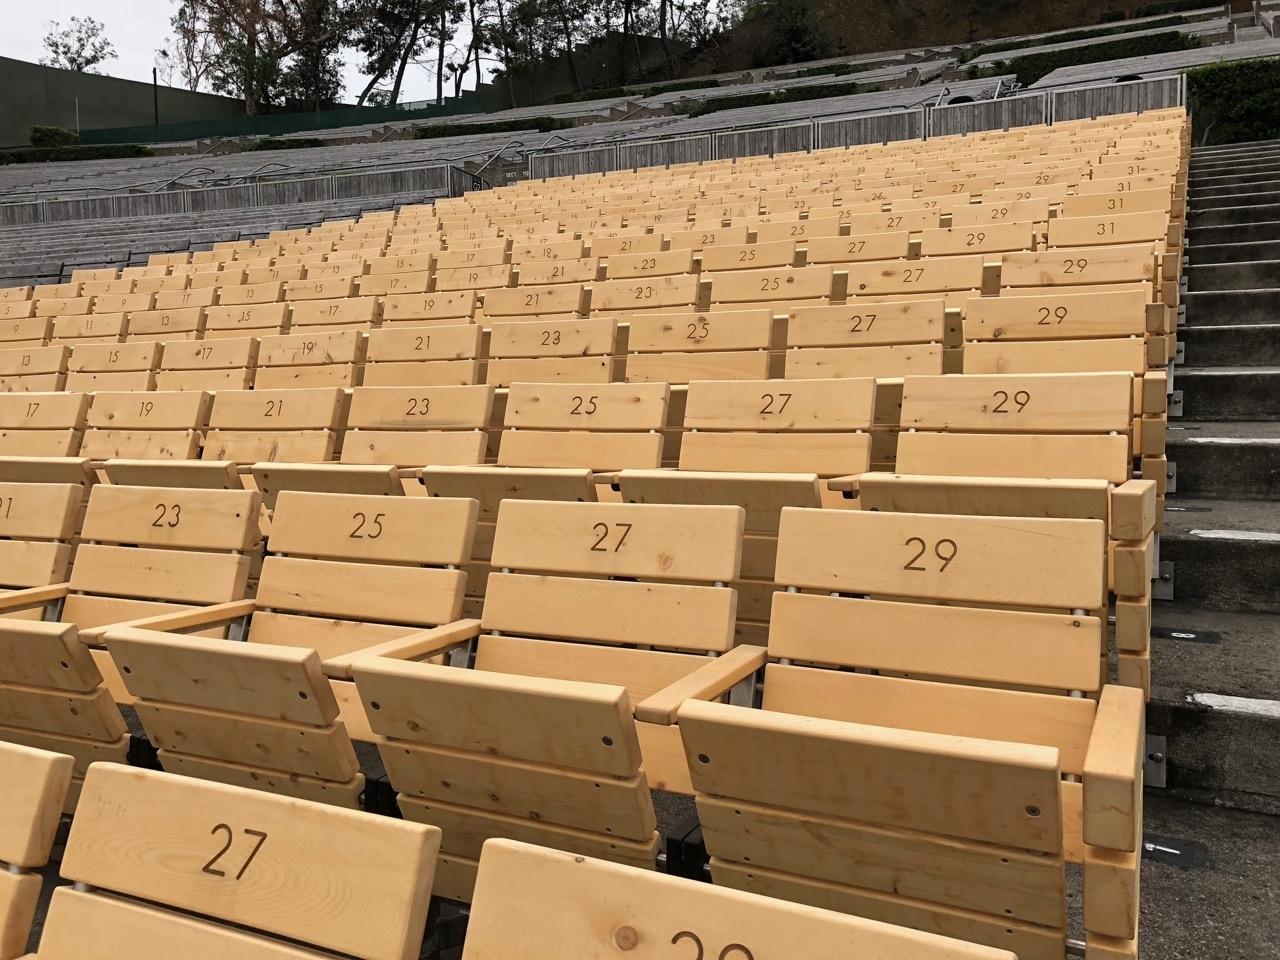 Hollywood Bowl Super Seats Get A Makeover - Hollywood Bowl Tips pertaining to Hollywood Bowl Seating Chart Super Seats